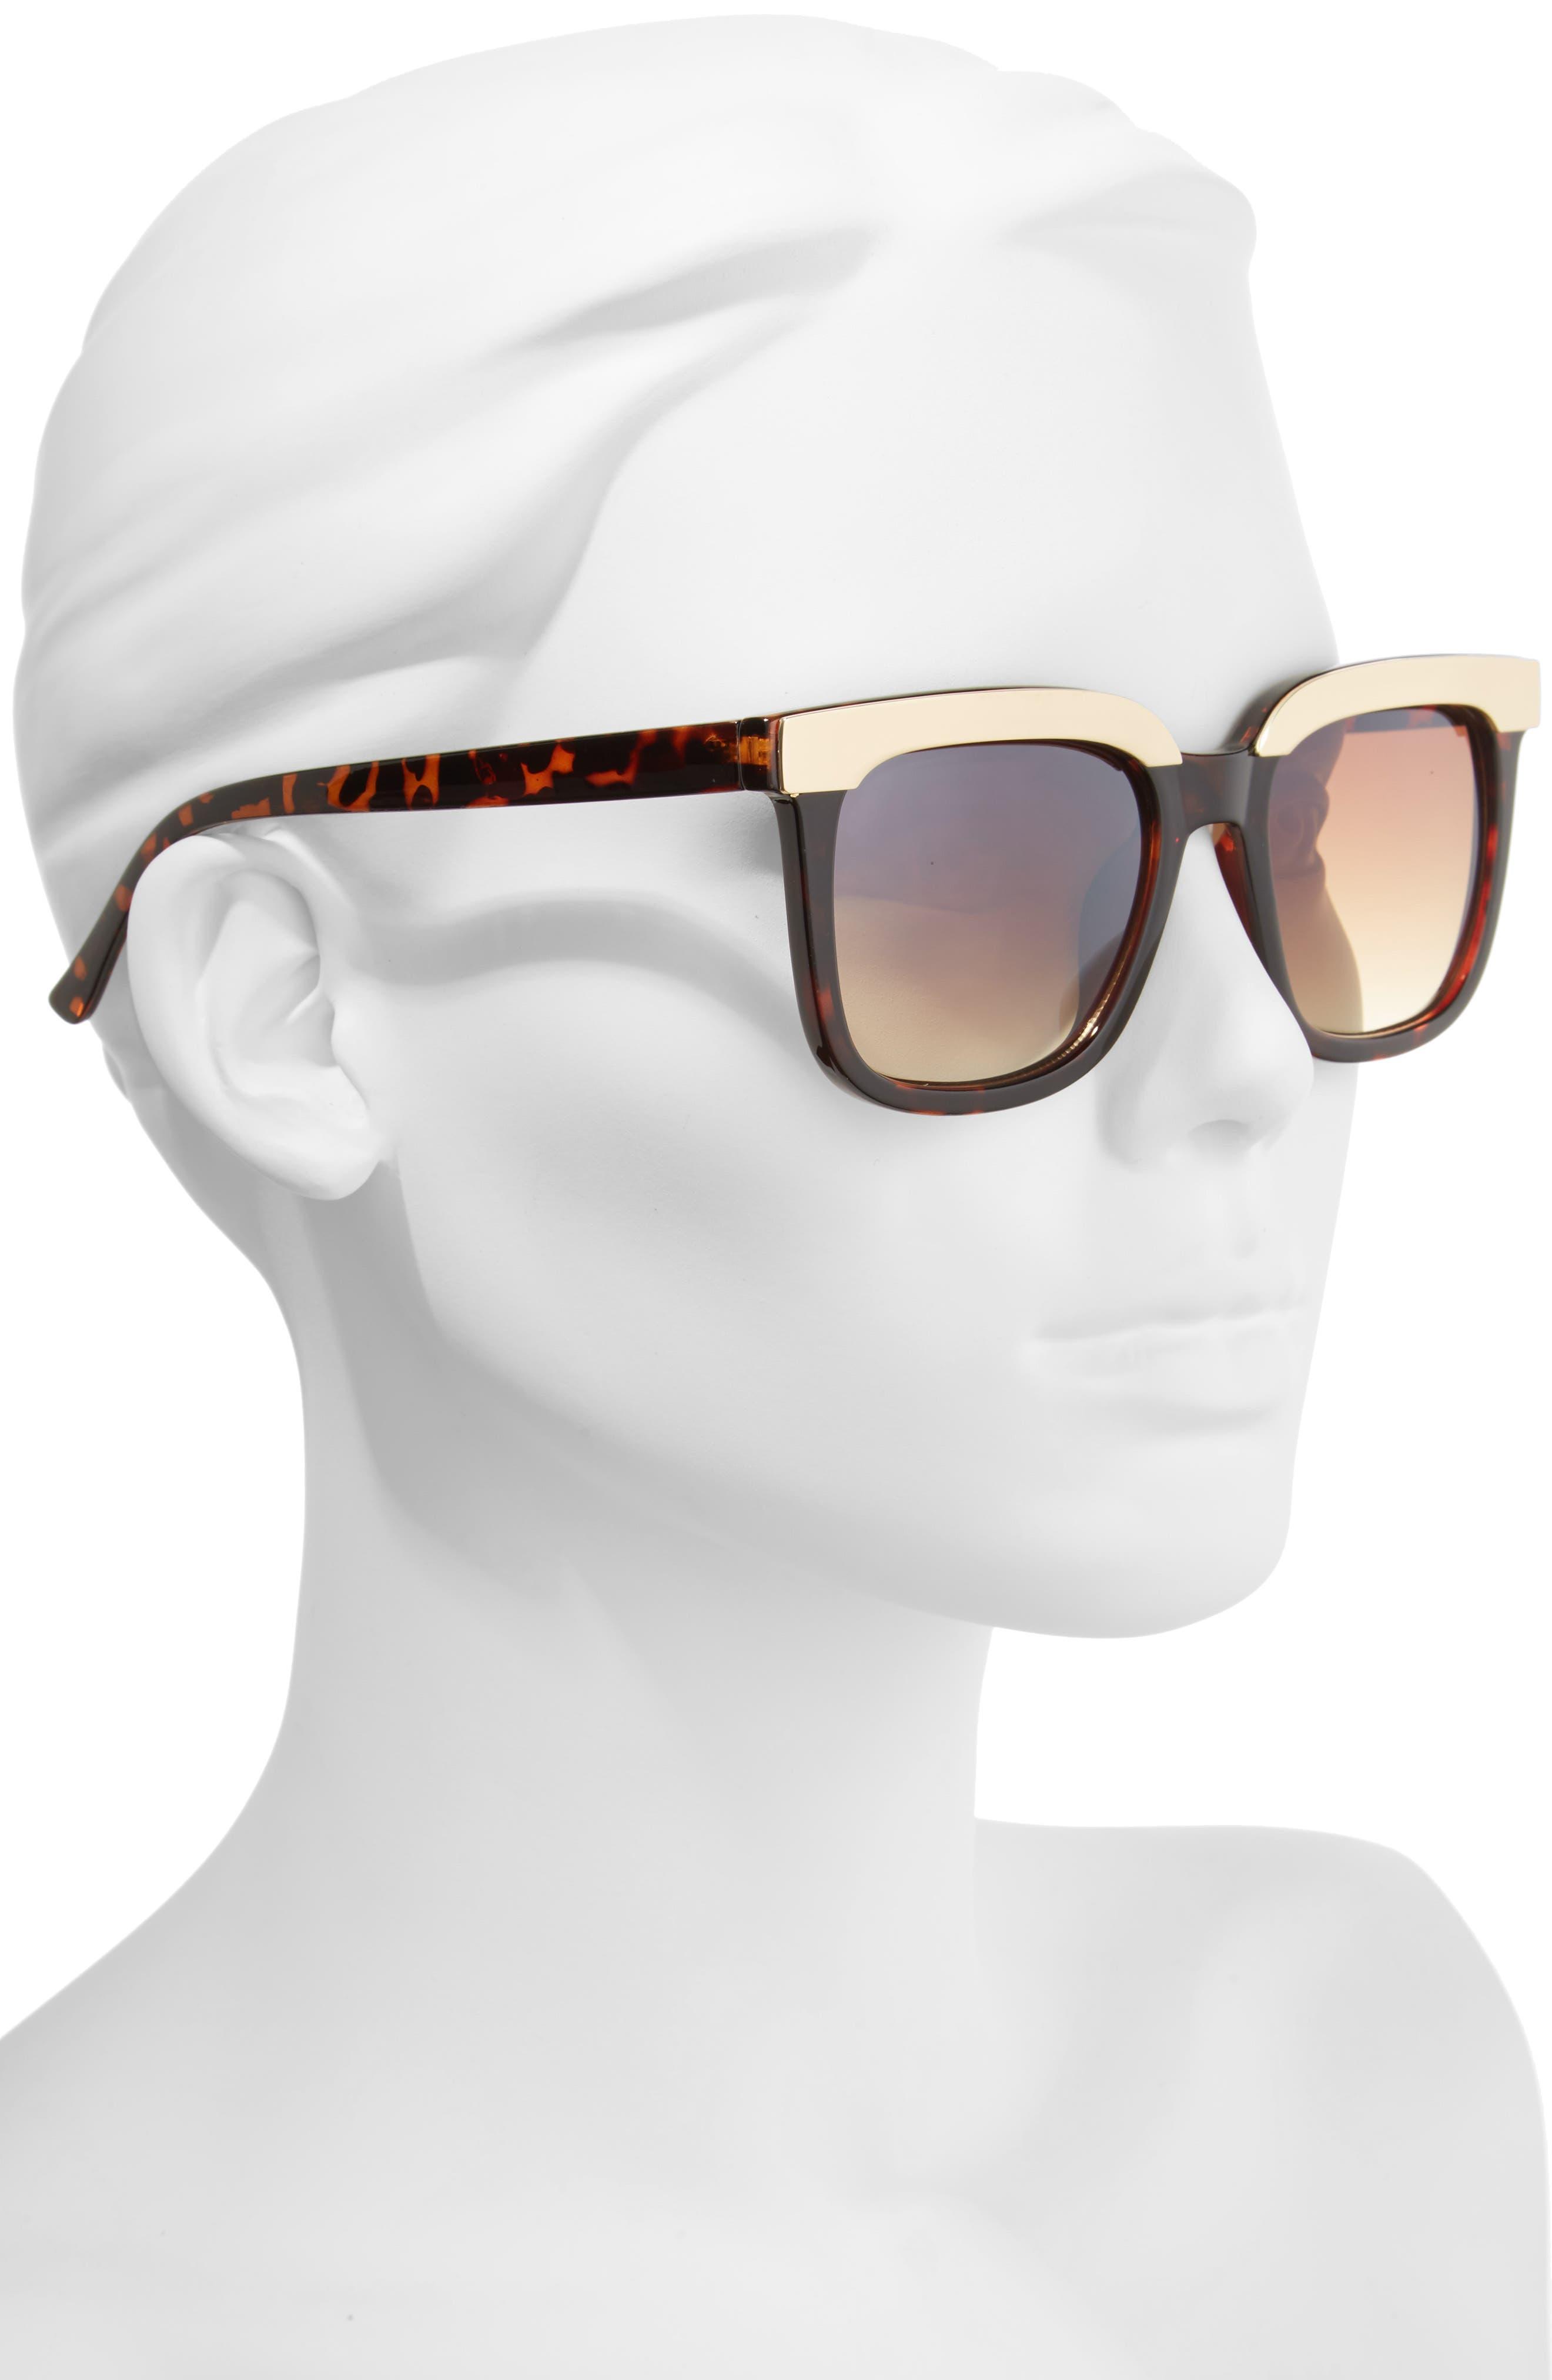 52mm Metal Dipped Square Sunglasses,                             Alternate thumbnail 2, color,